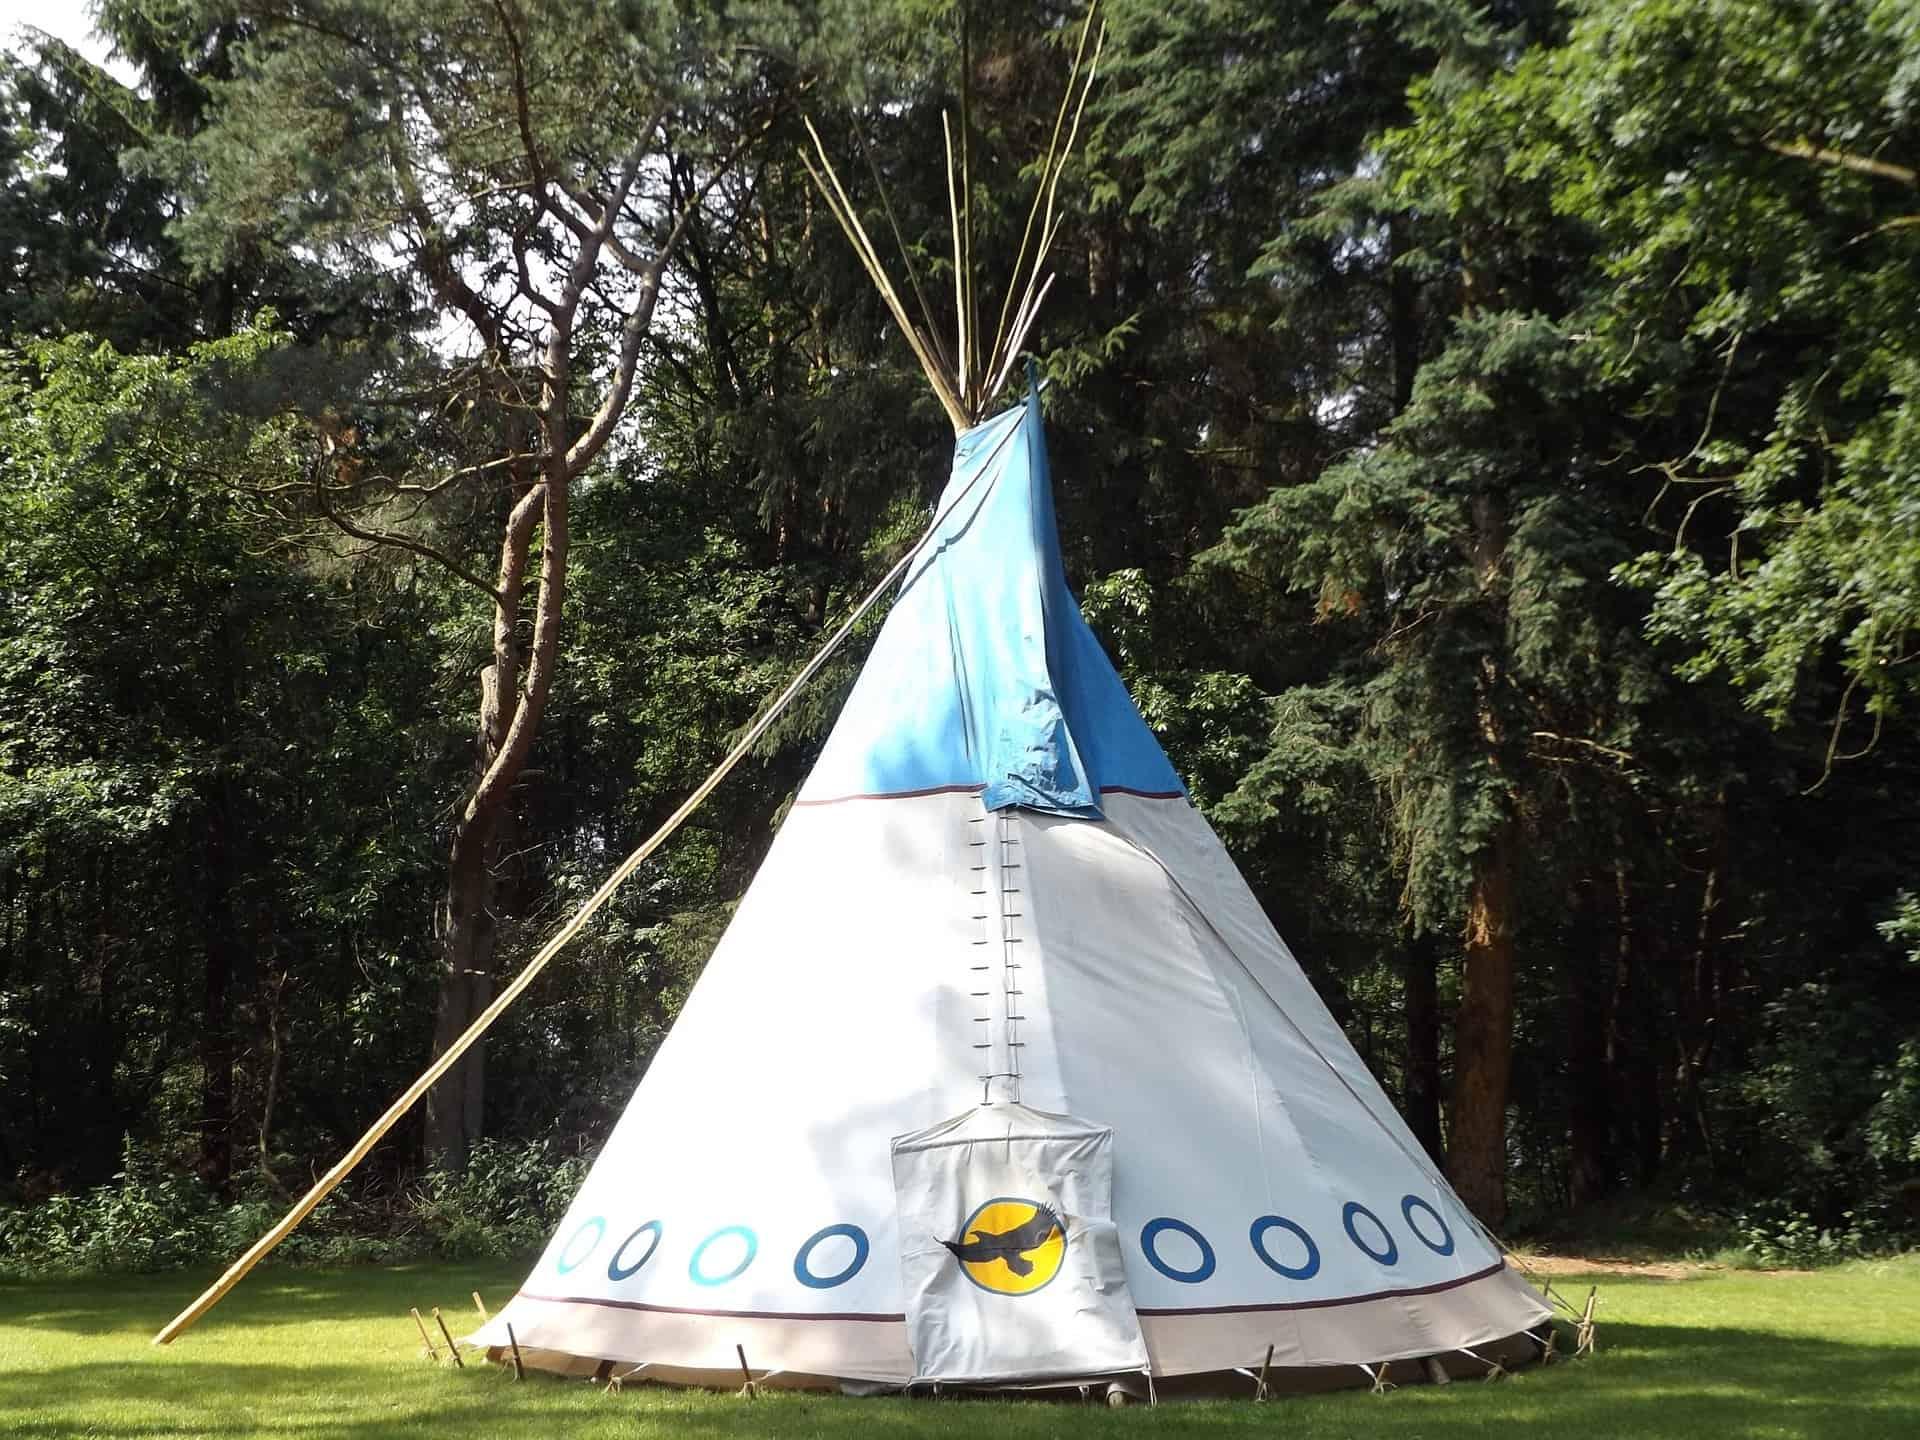 Kinder Tipi Zelt Test 2020: Die besten Tipi Zelte im Vergleich